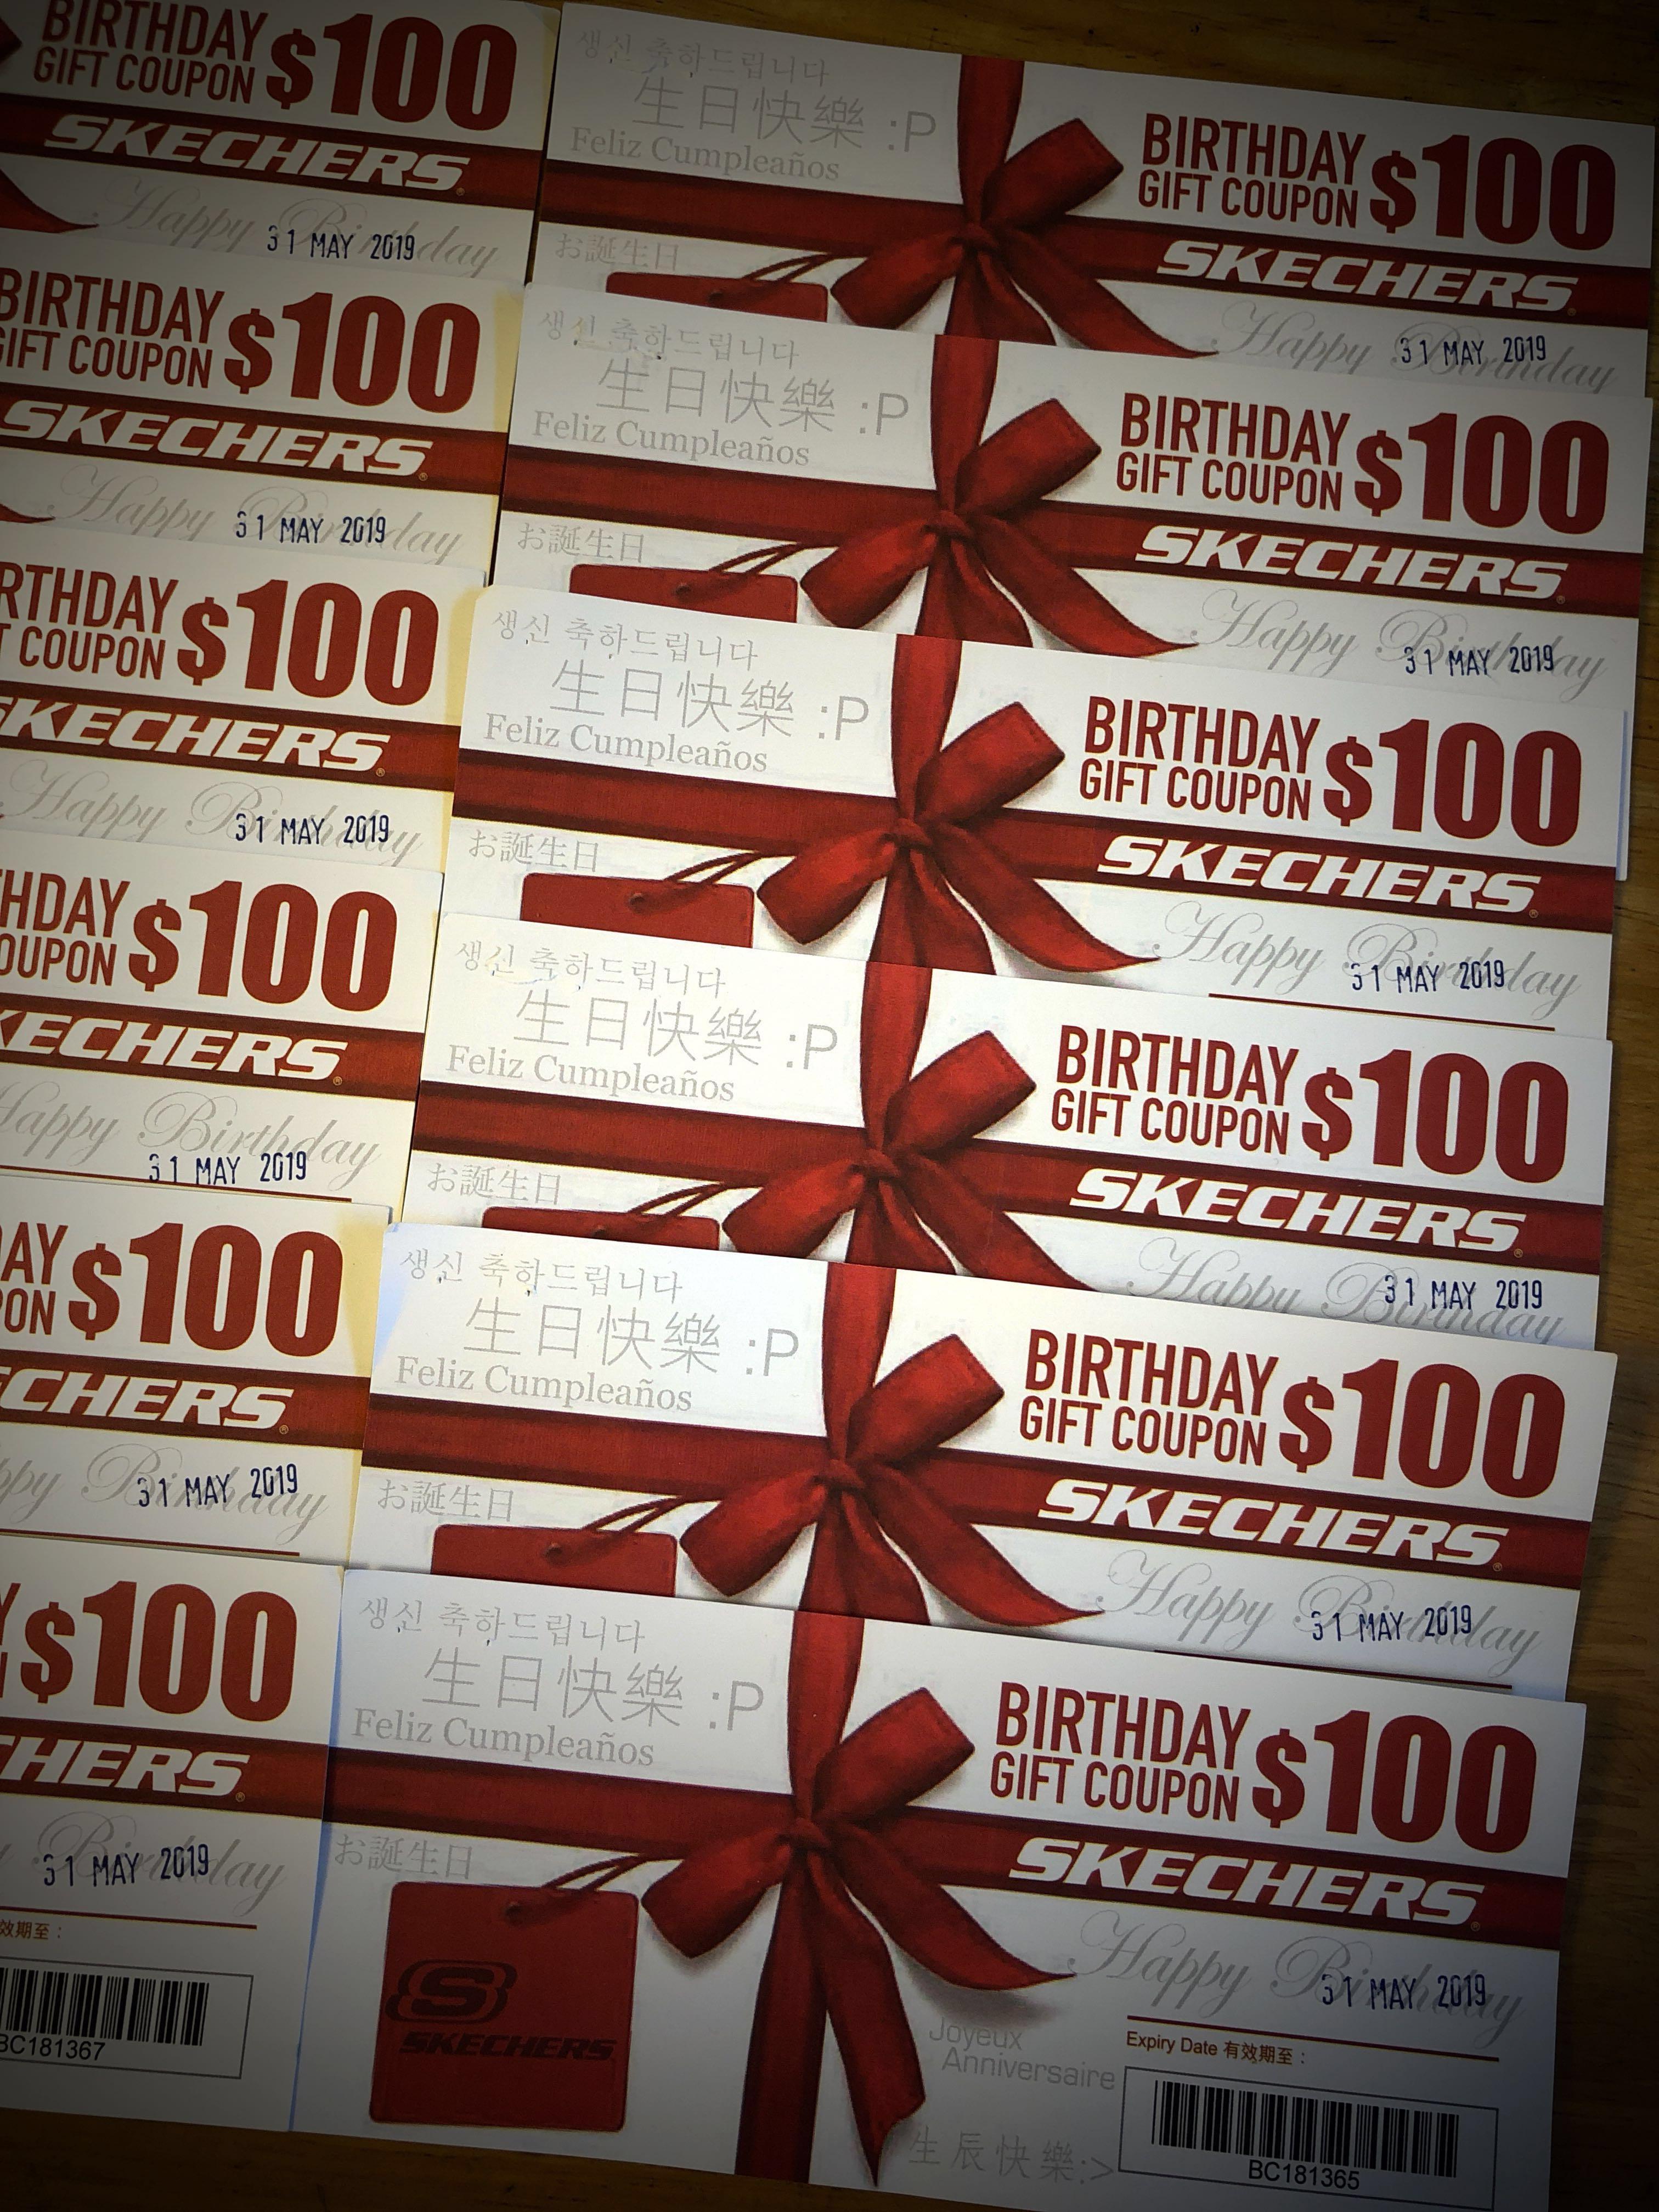 SKECHERS / MARK NASON LOS ANGELES GIFT COUPON $100